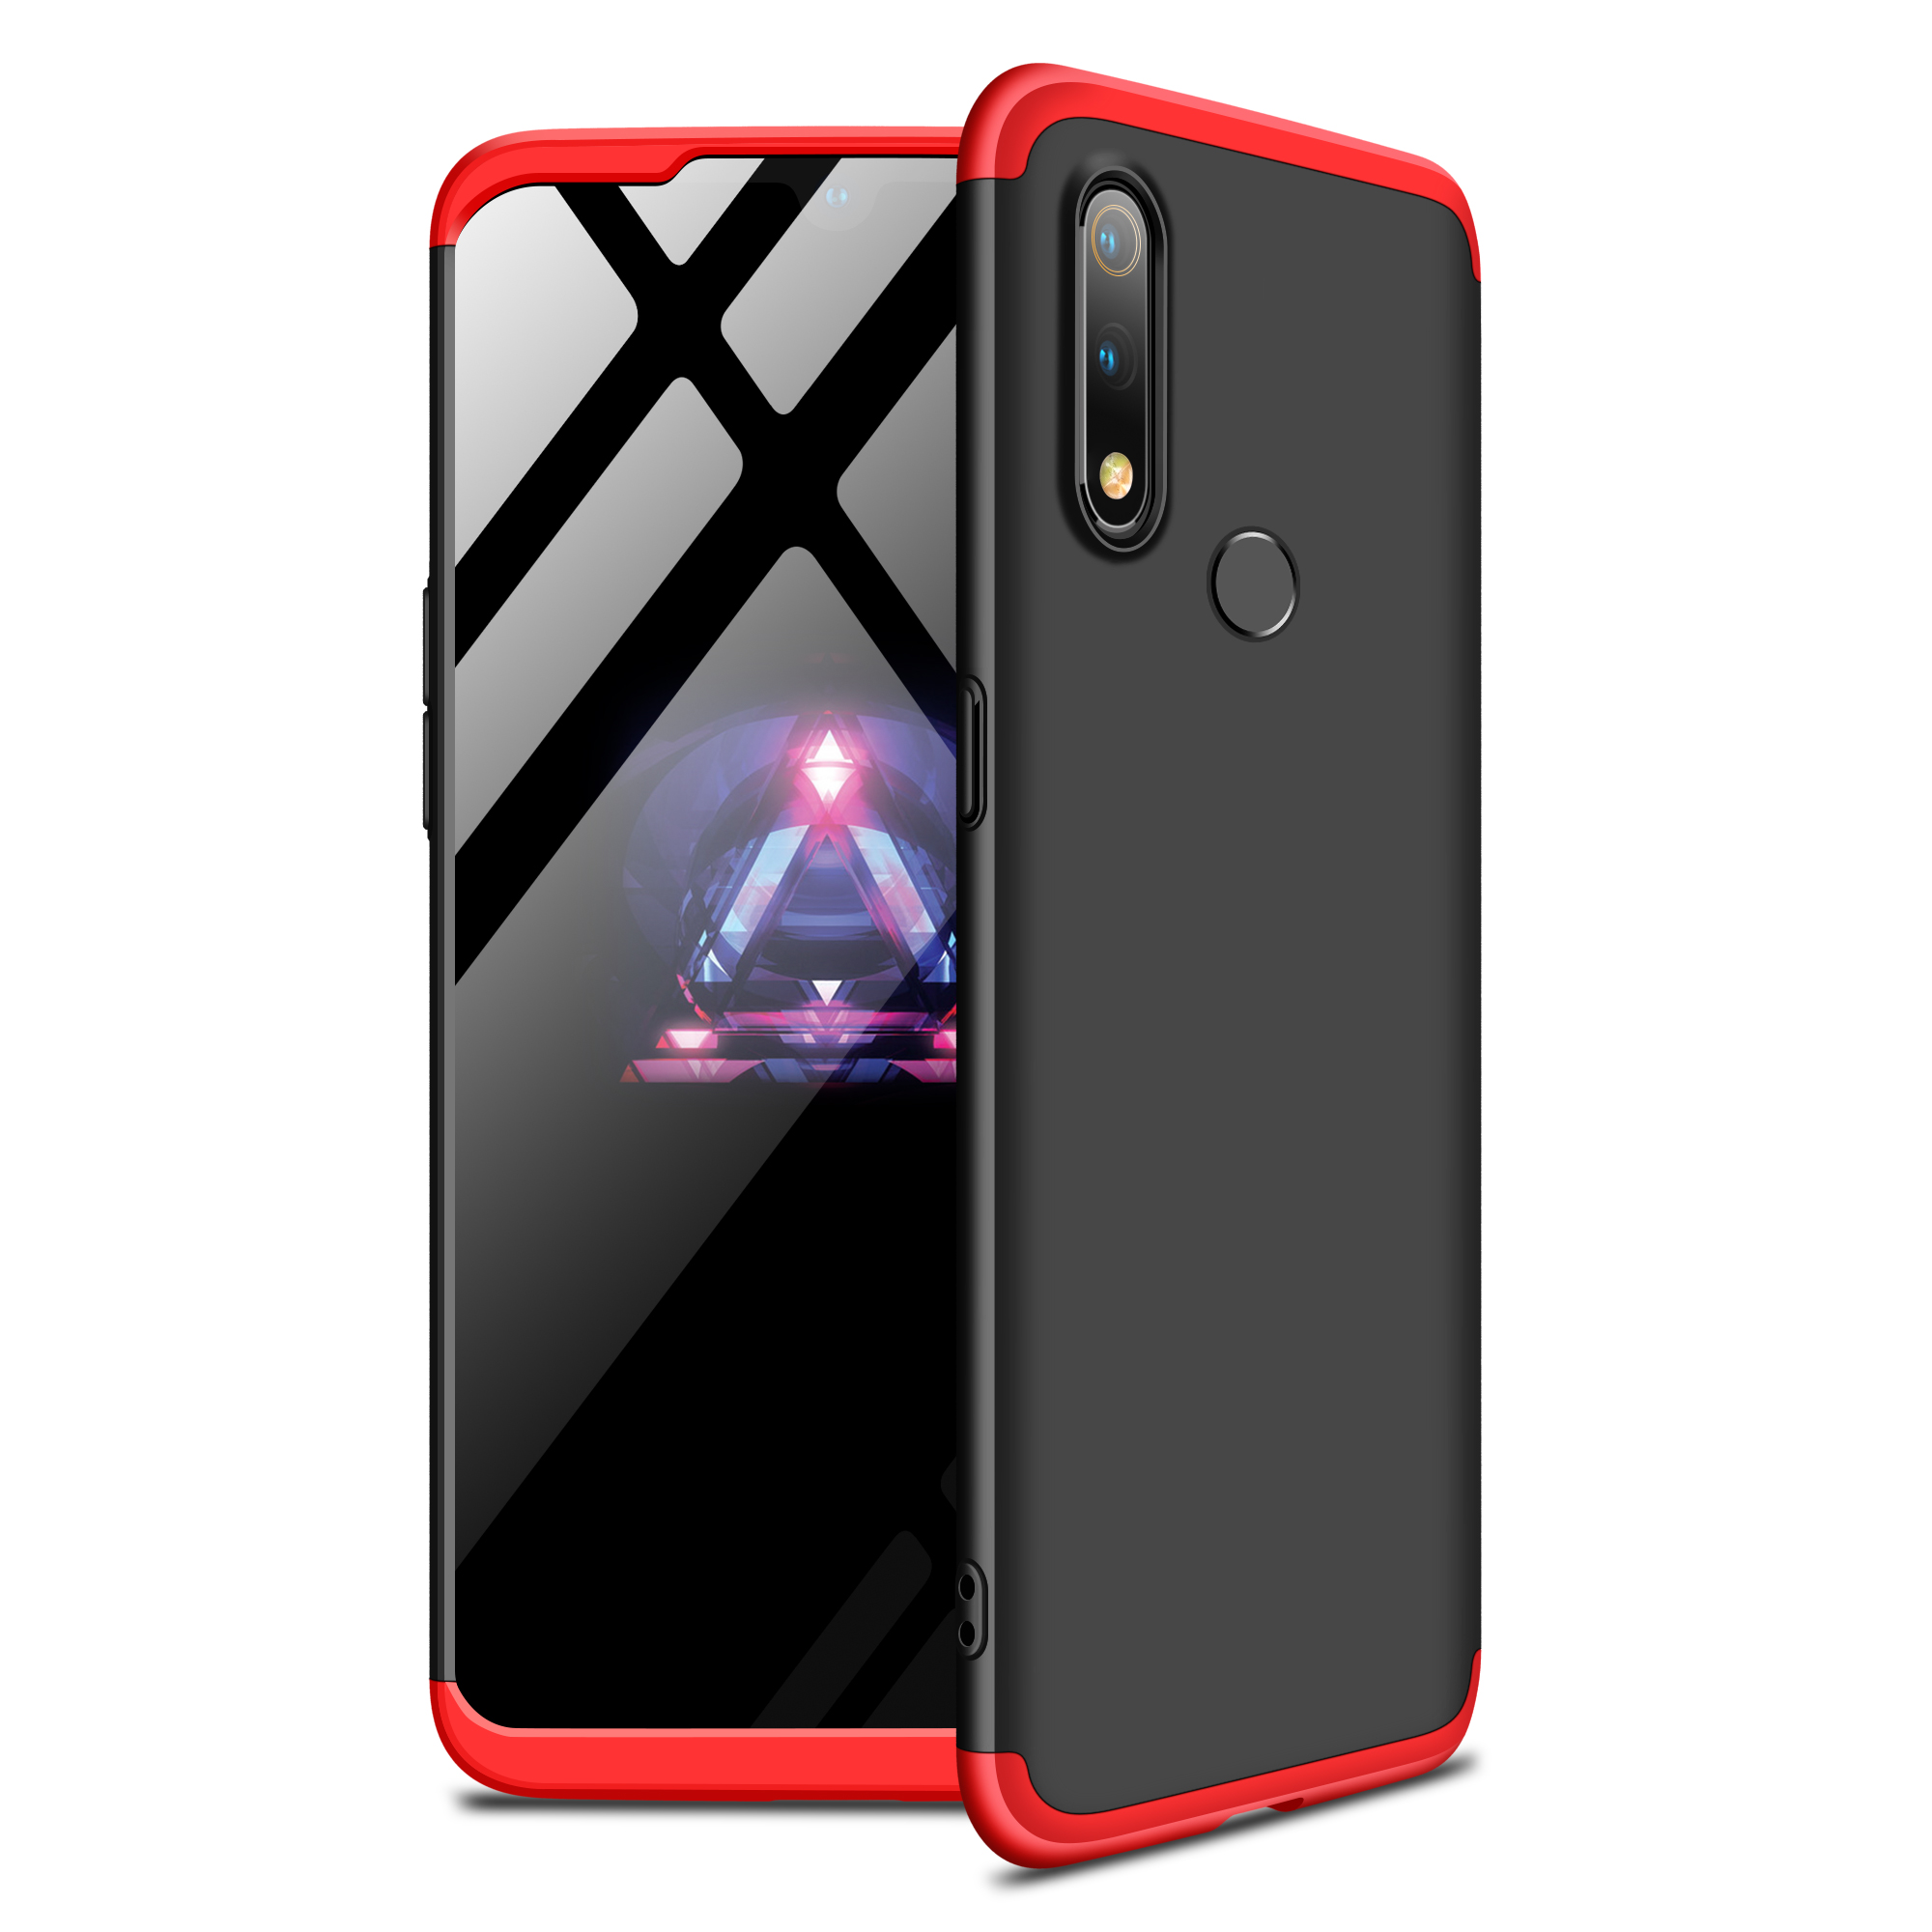 For Oppo Realme 3 pro Ultra Slim PC Back Cover Non-slip Shockproof 360 Degree Full Protective Case Red black red